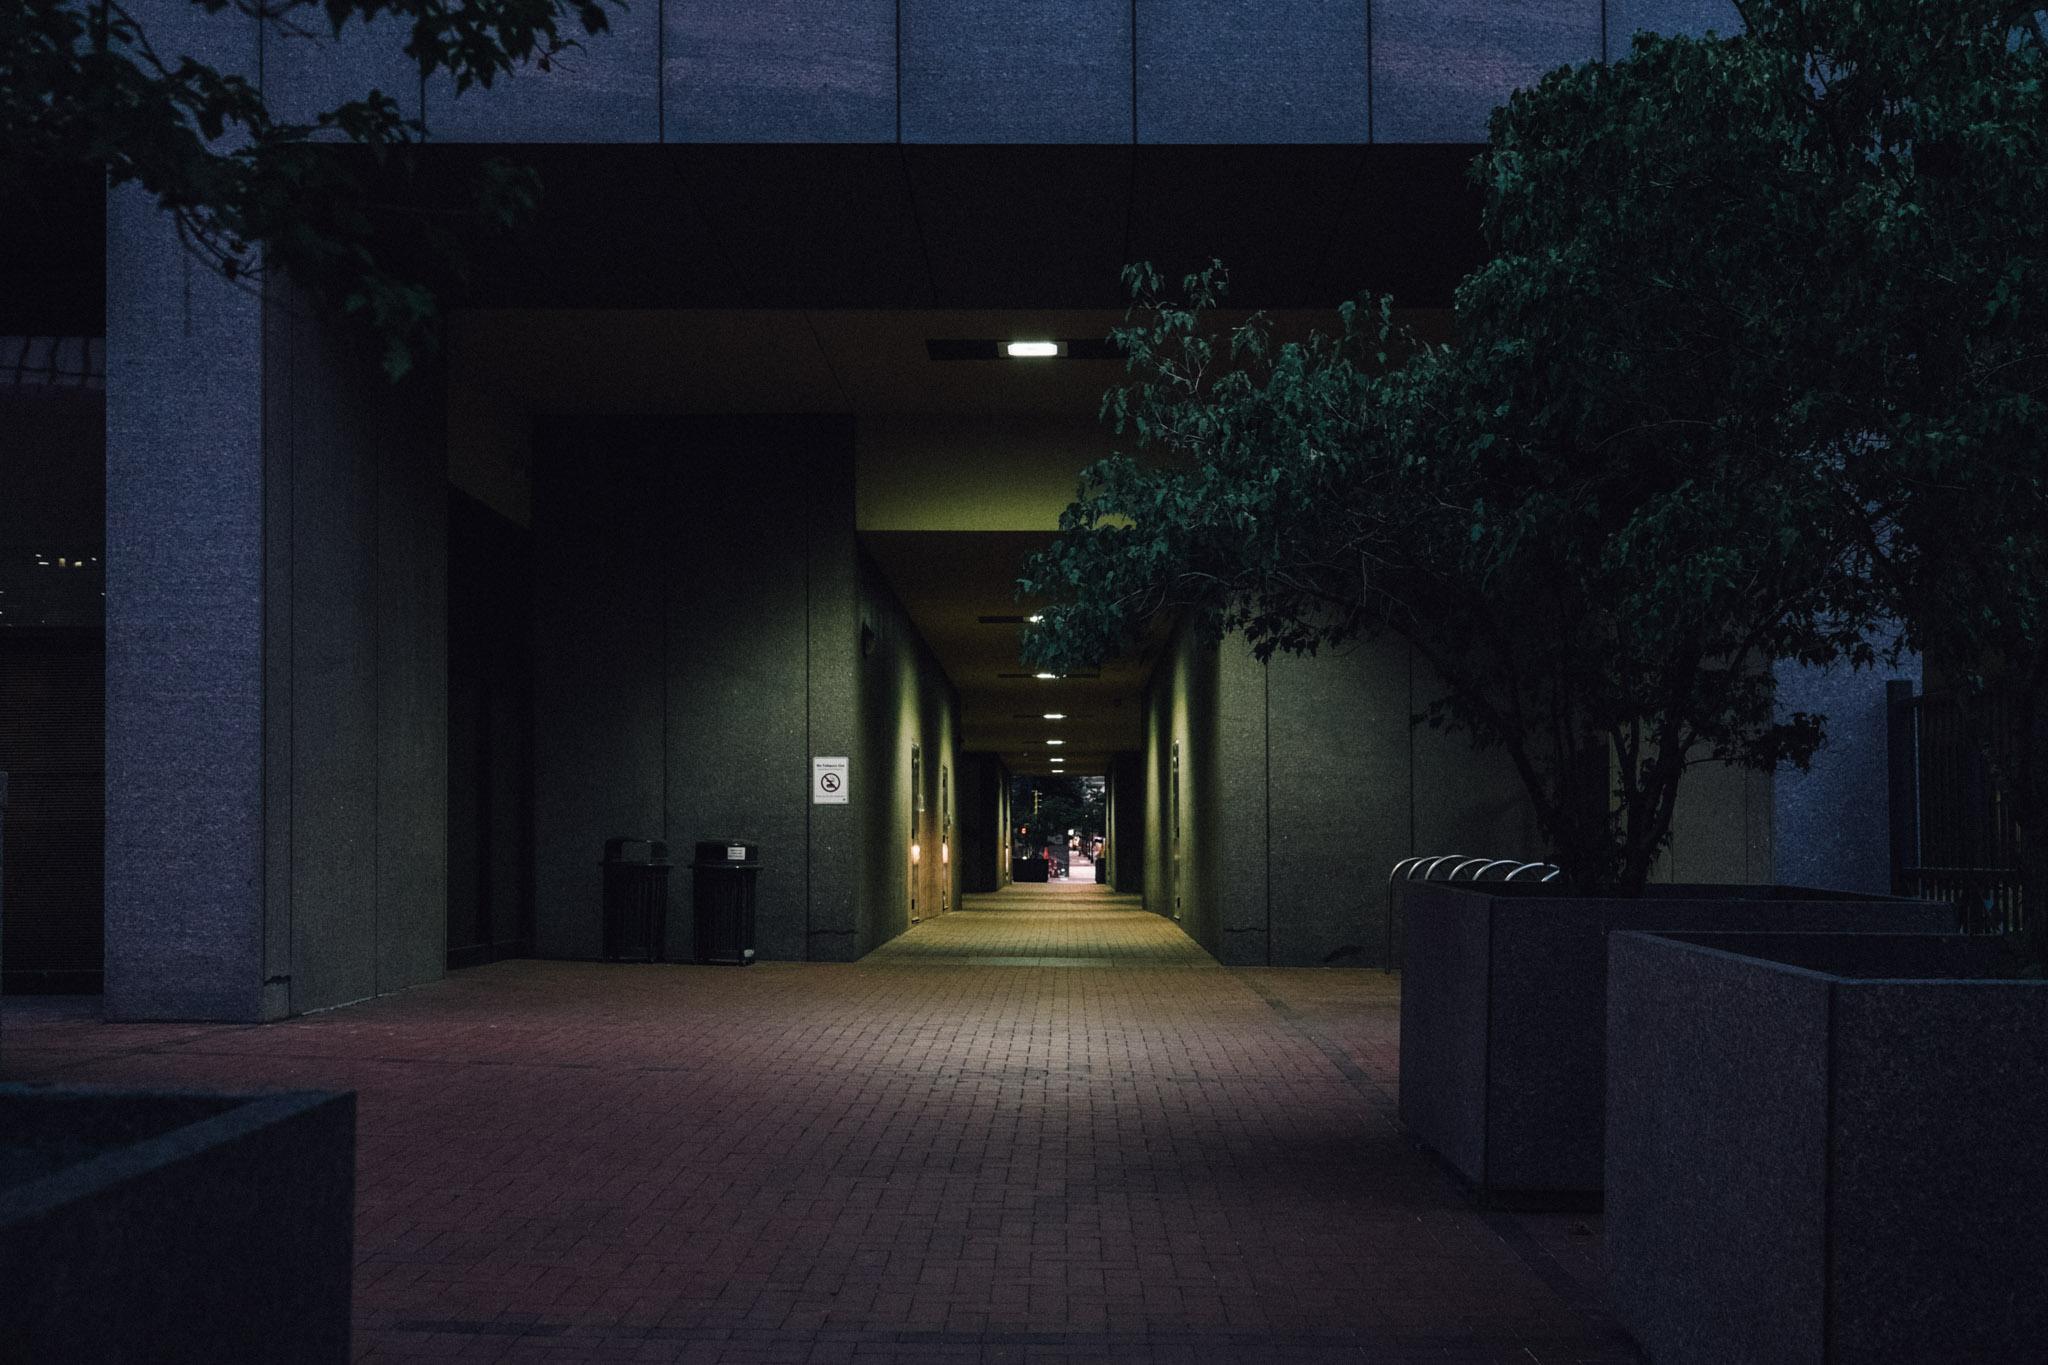 streets-04.jpg